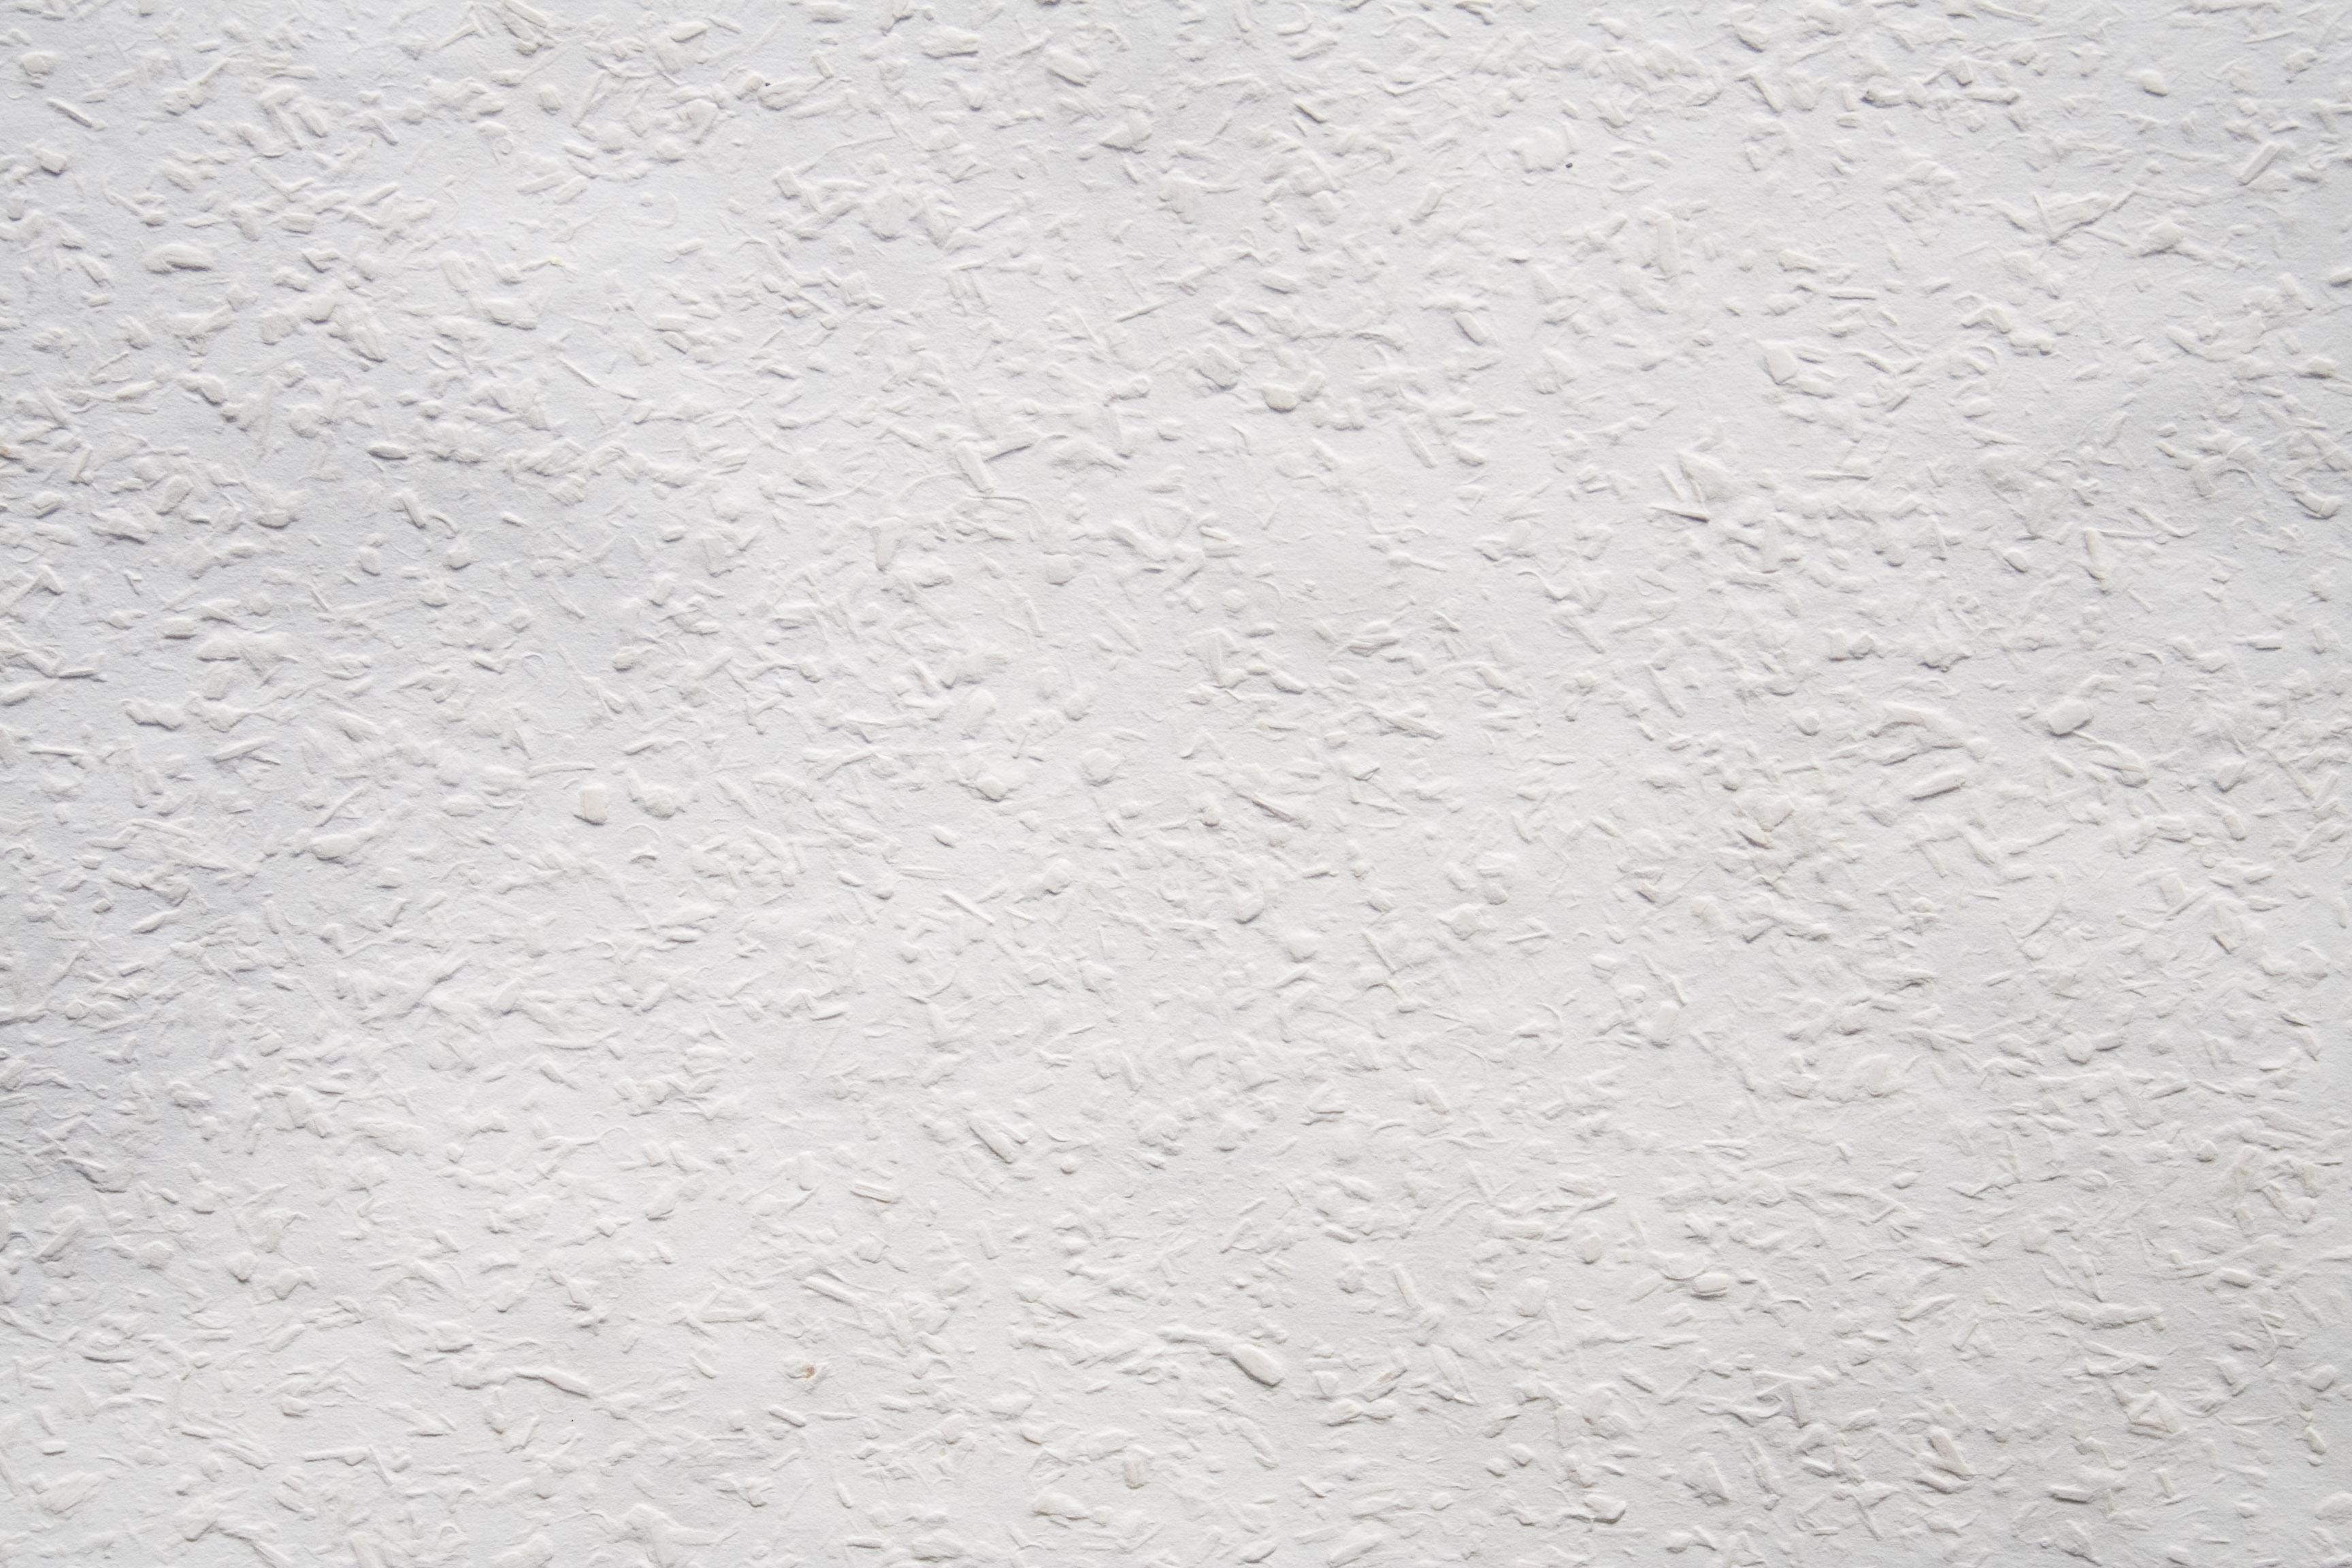 White Wallpaper Texture Wallpapersafari